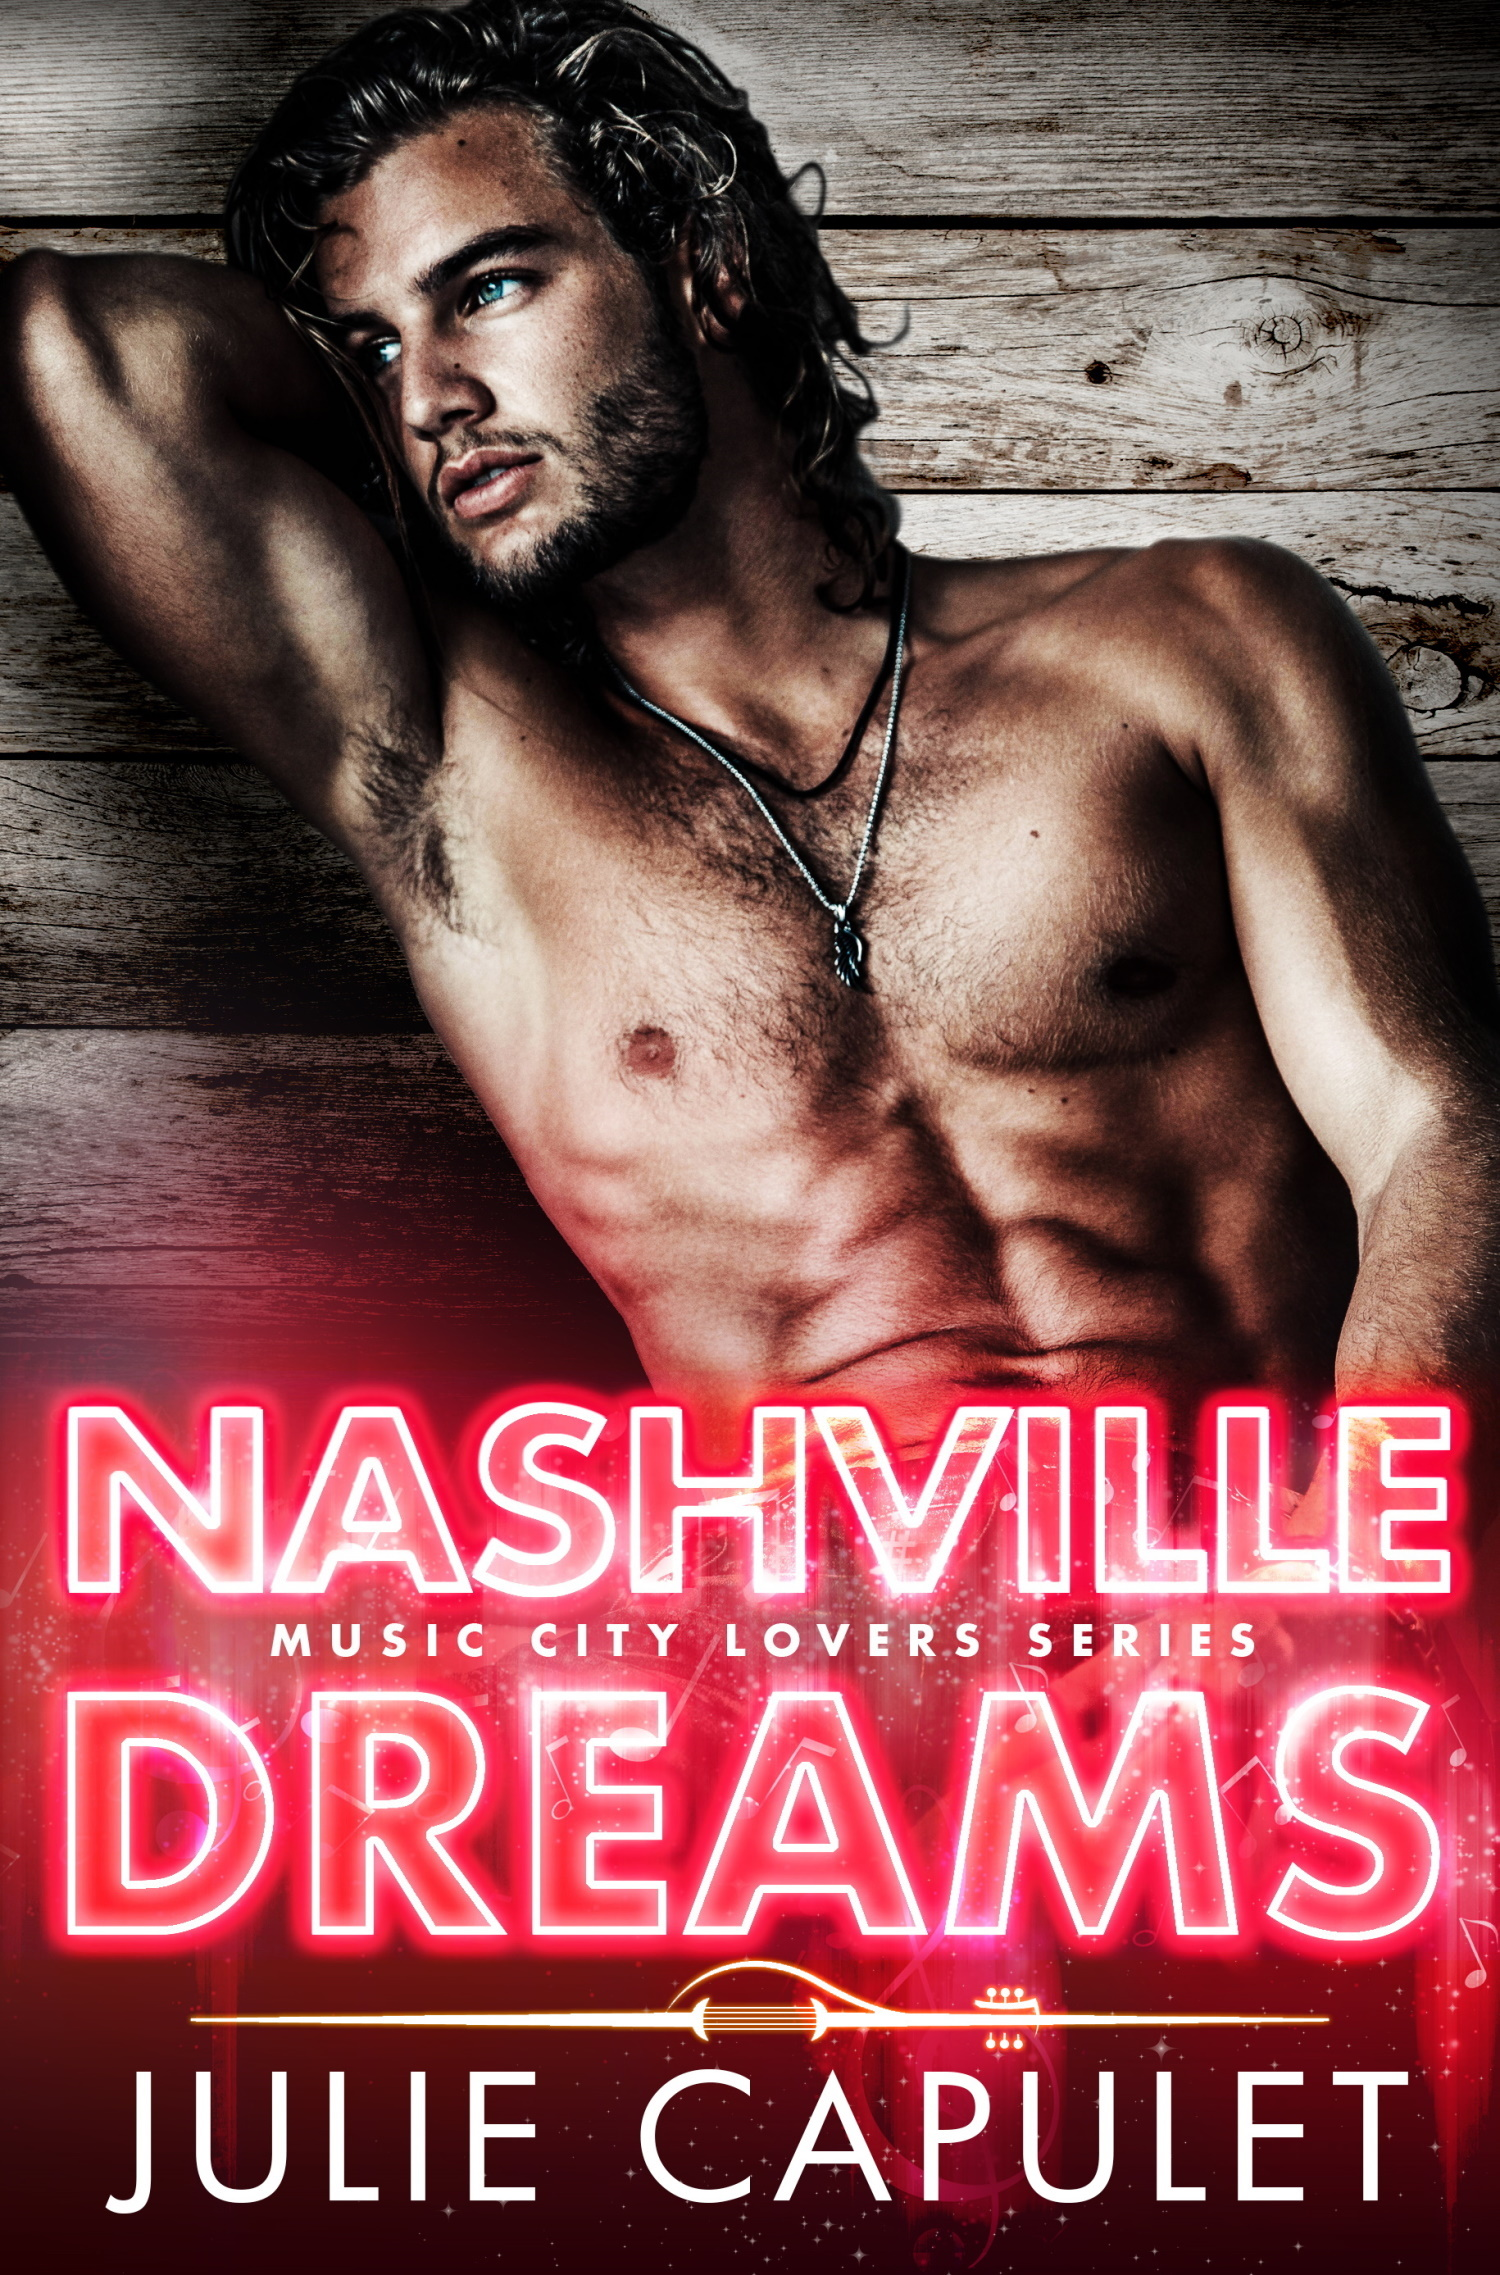 Nashville Dreams (Music City Lovers #3)